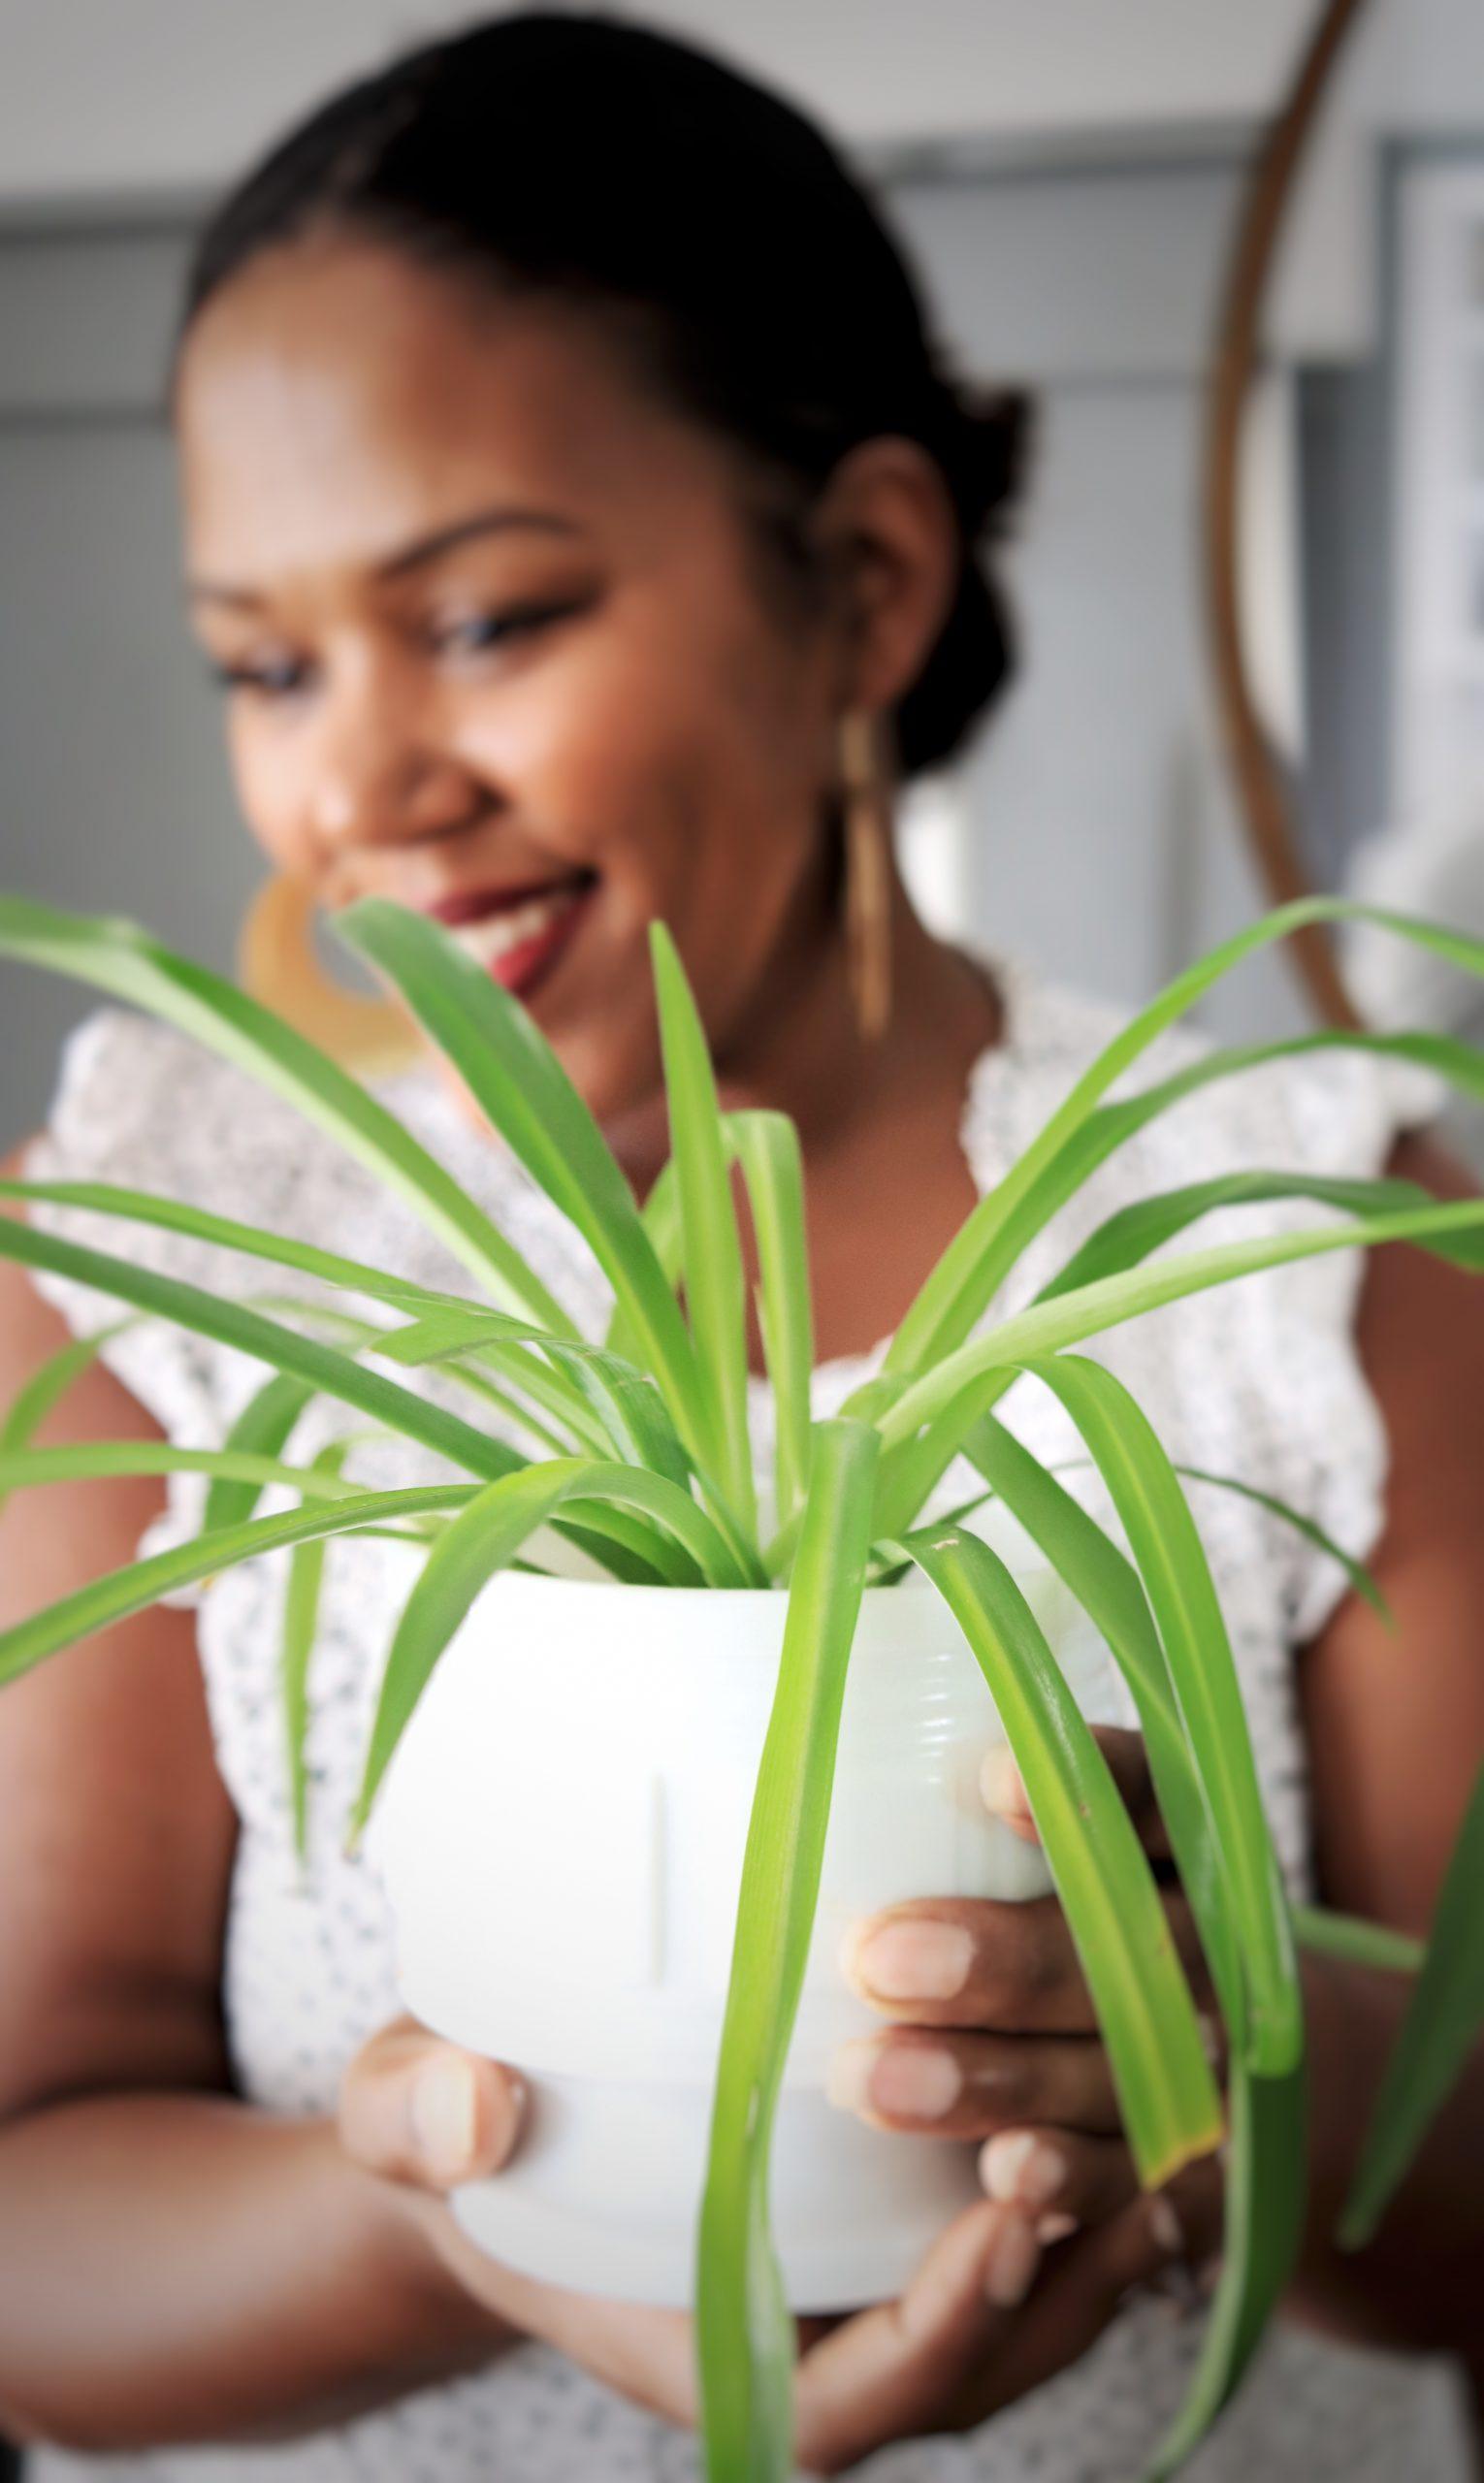 Spider plant propagation